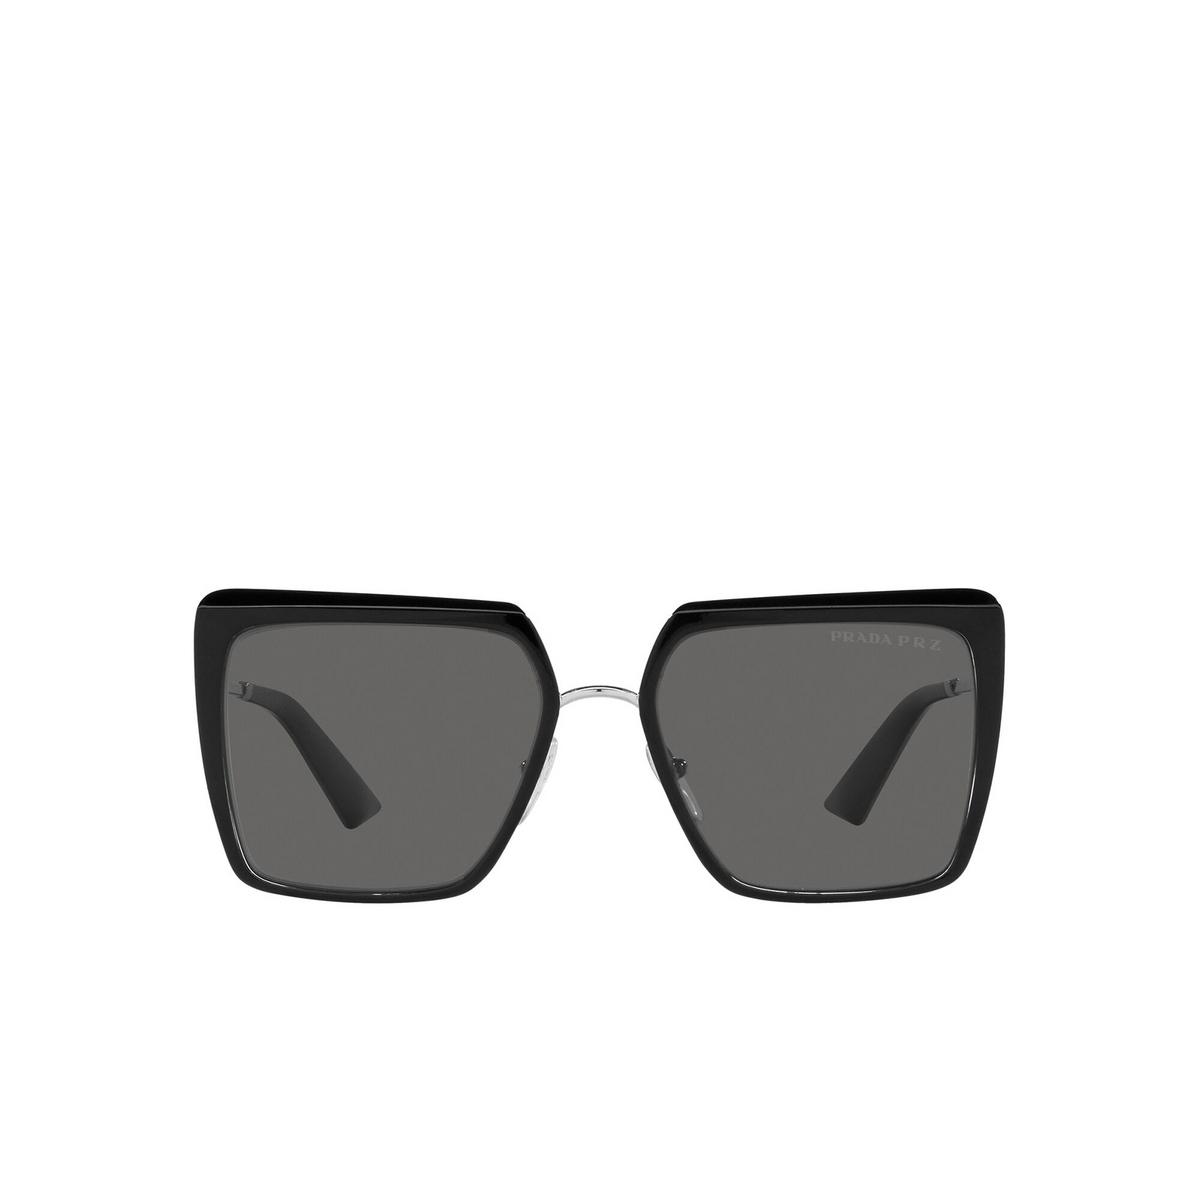 Prada® Square Sunglasses: PR 58WS color Black 1AB5Z1 - front view.